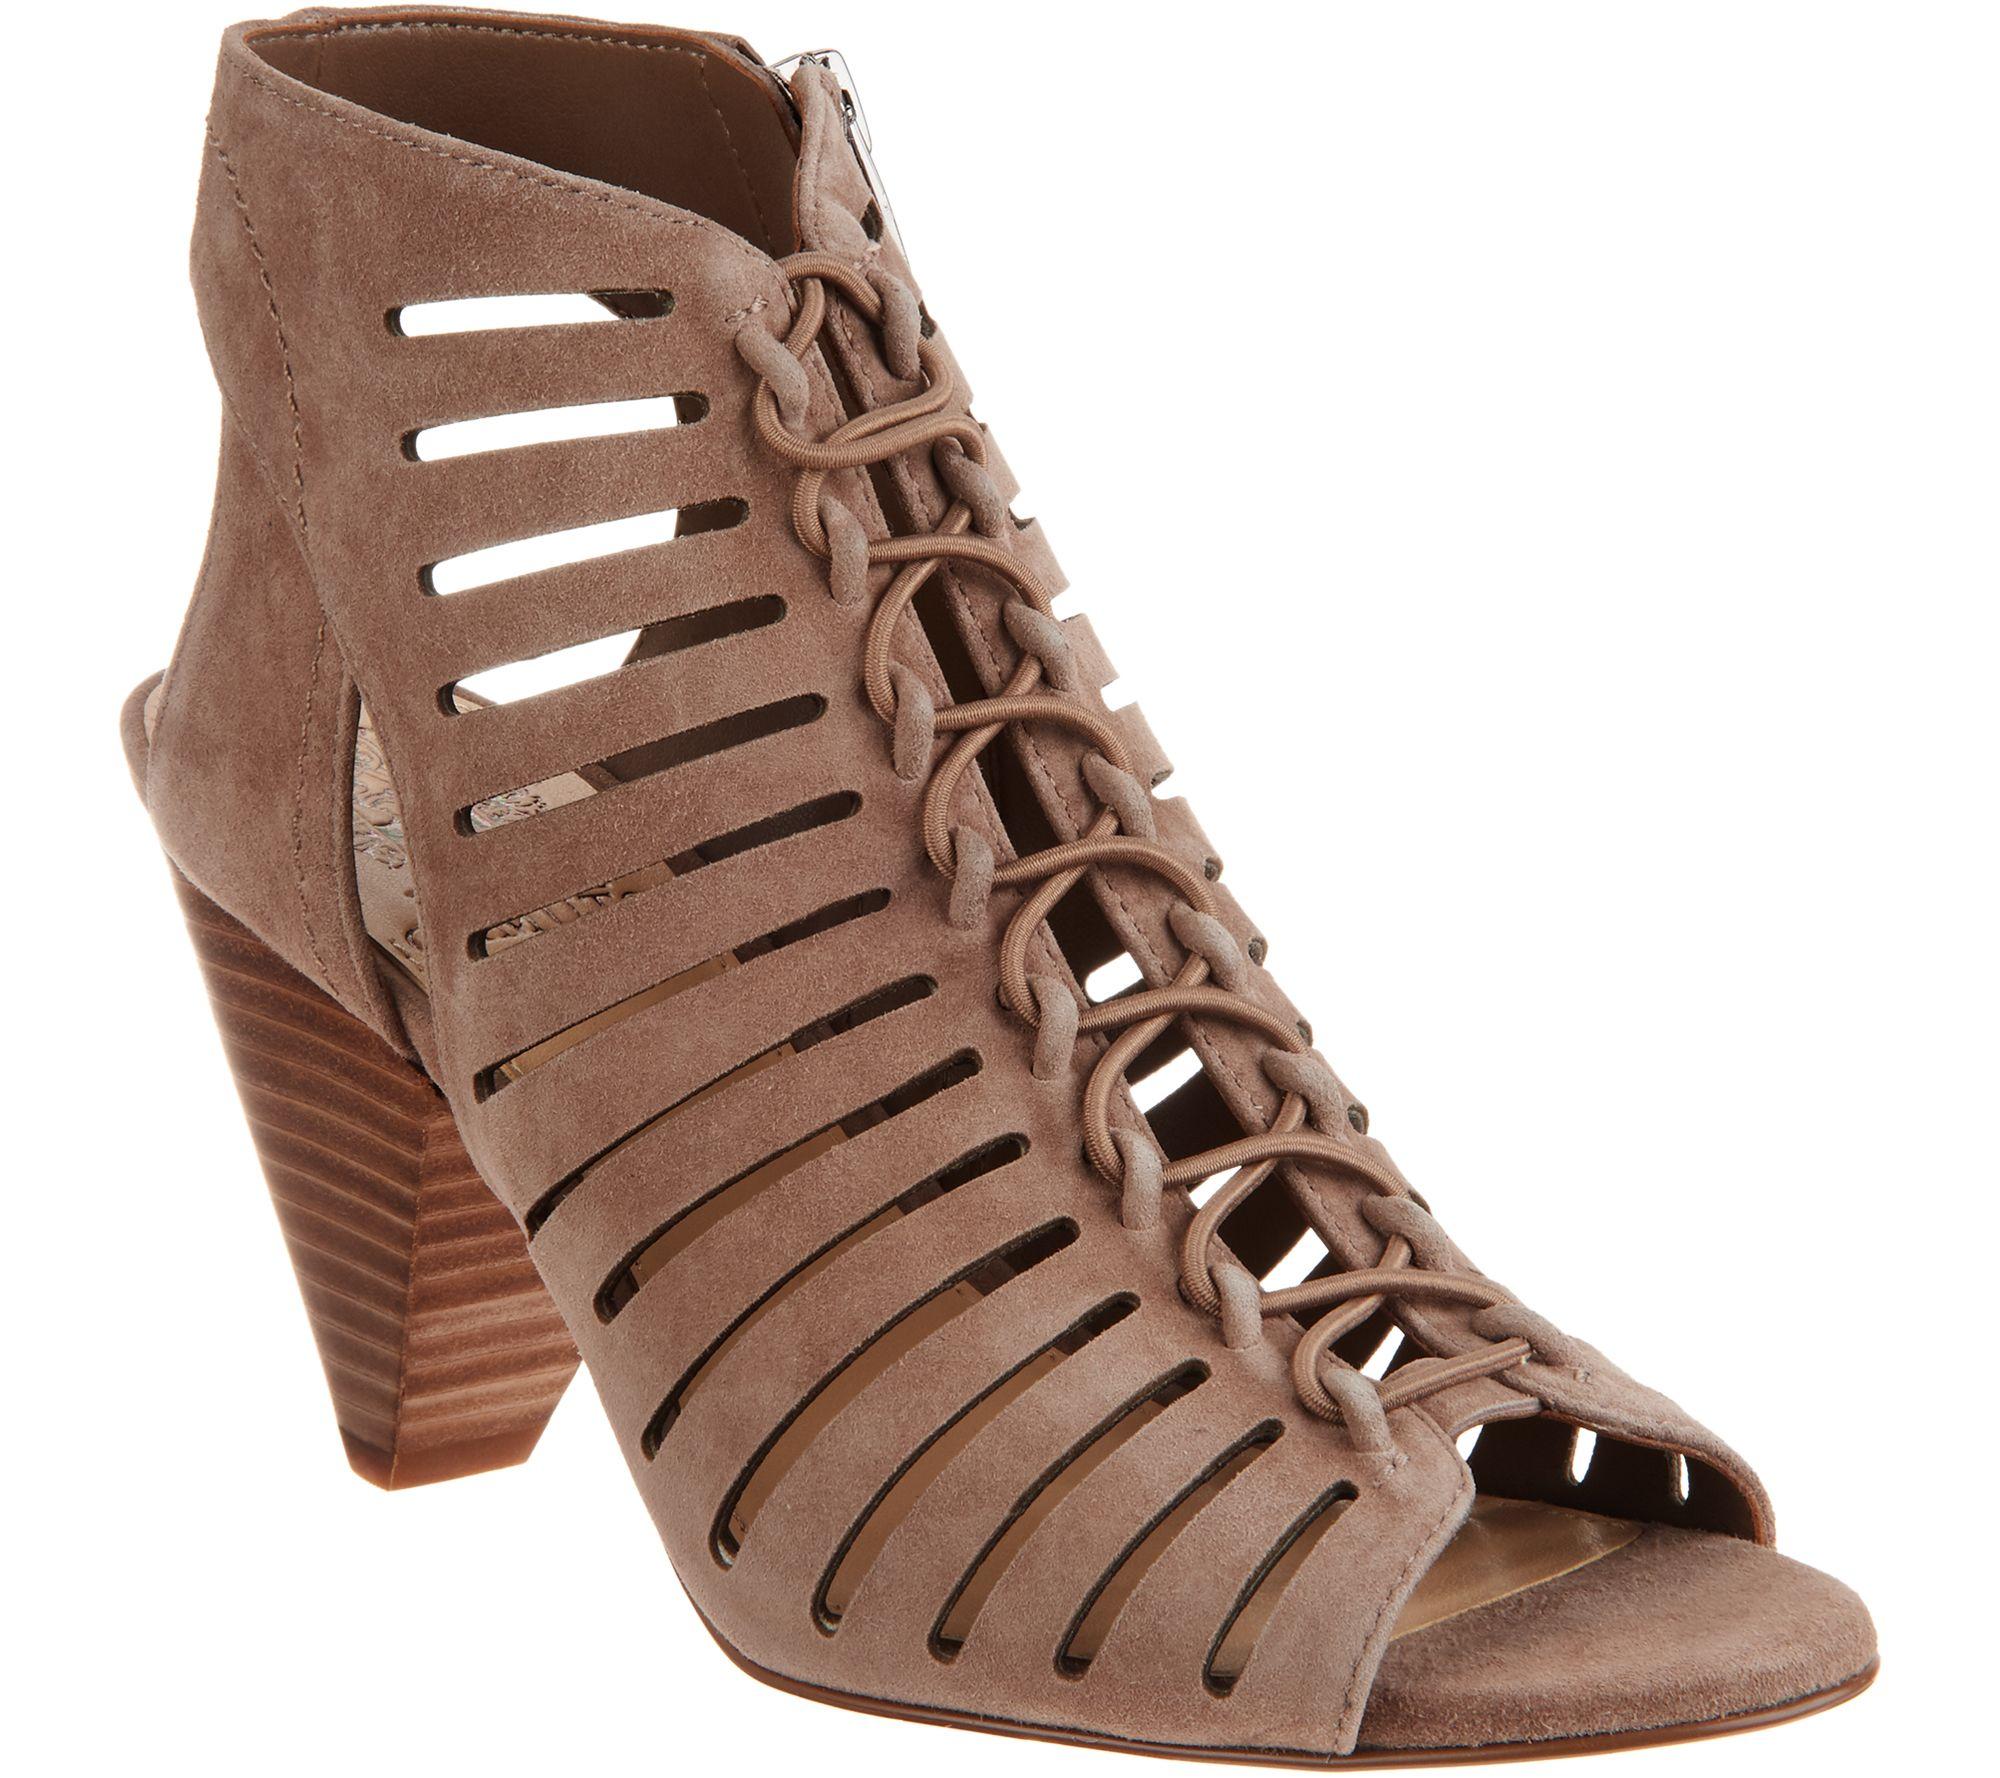 665b790943a1 Vince Camuto Nubuck Leather Peep Toe Sandals - Evalan - Page 1 — QVC.com